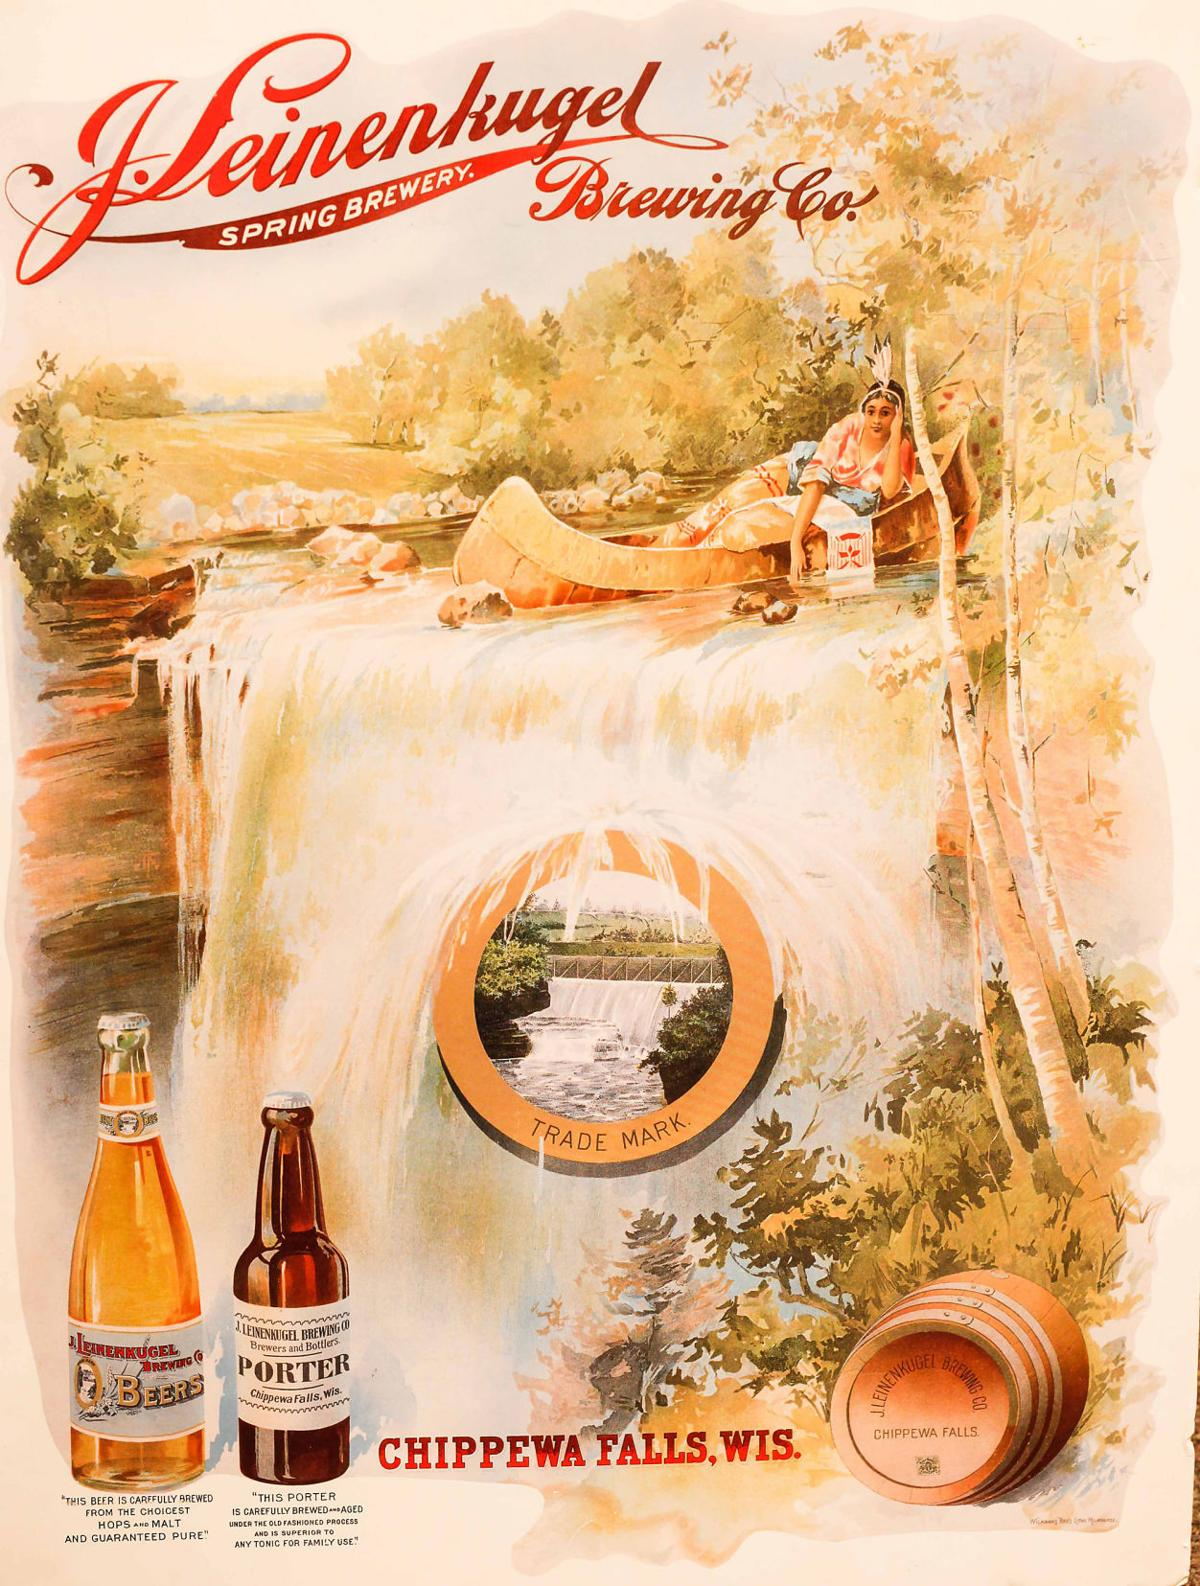 Where to buy leinenkugel s grapefruit shandy - Leinenkugel S Has Relied On Family Leadership Innovation For 150 Years Business Report Chippewa Com